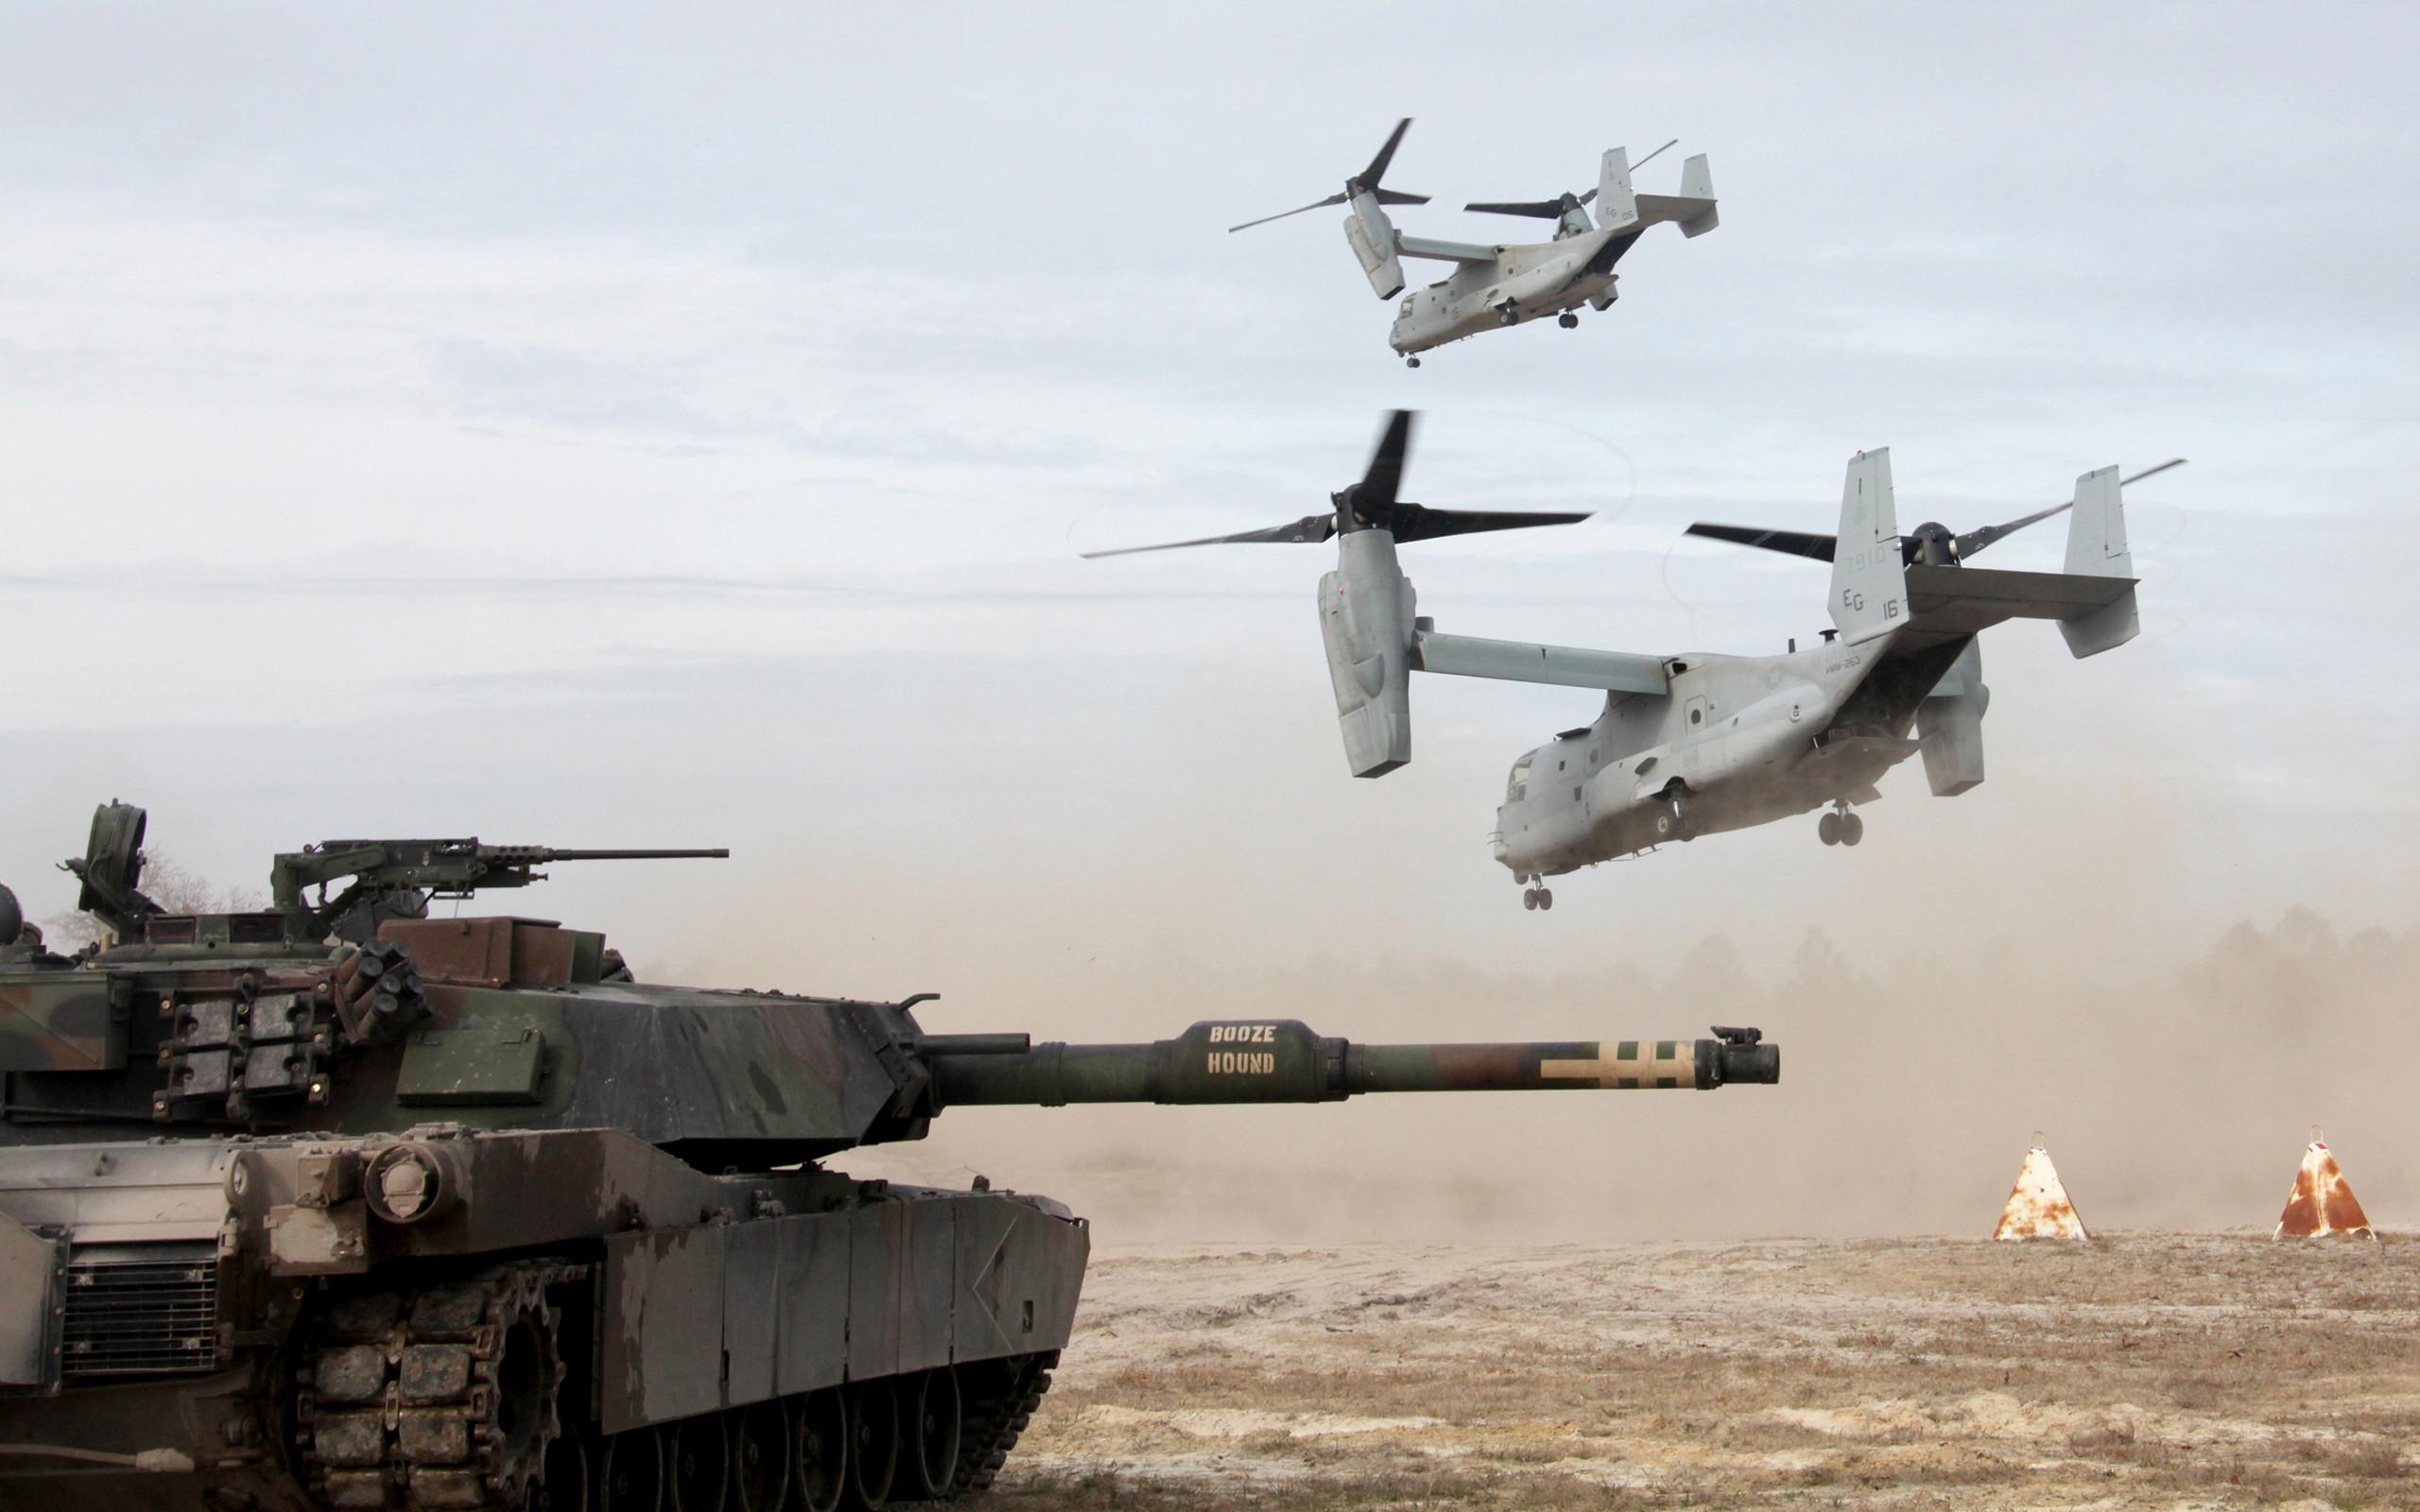 Aircraft M1A1 Abrams Tank Military Tanks United States Marine Corps V-22  Osprey